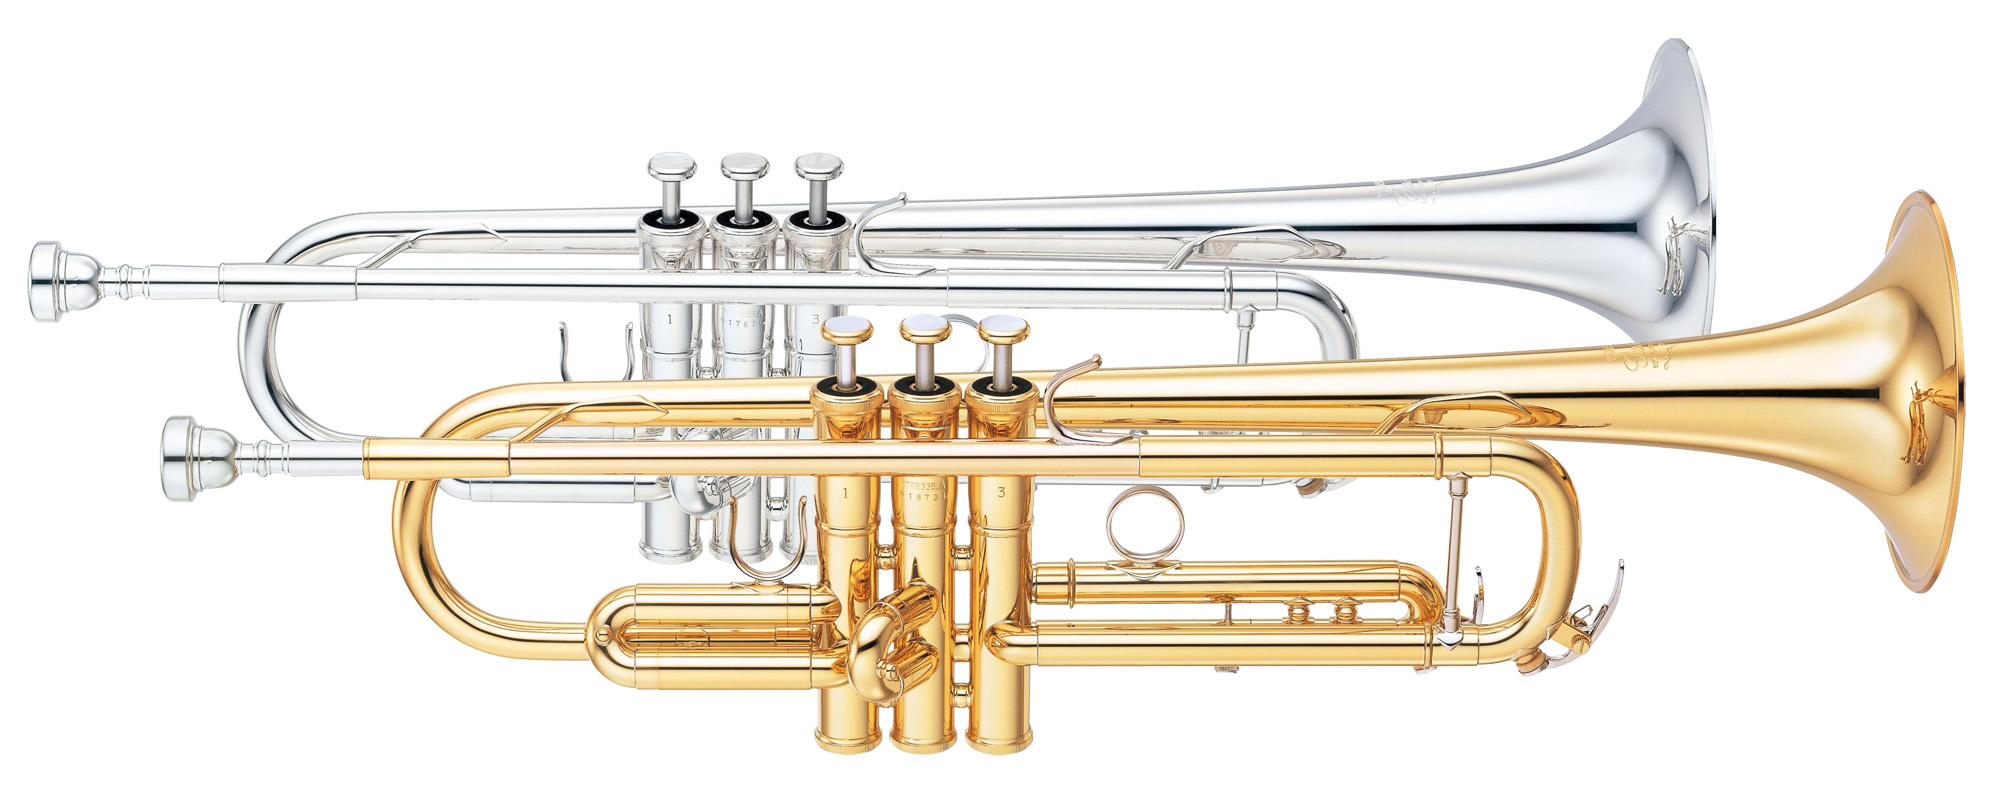 The Trumpet, Part I: Meet the UK's most popular brass